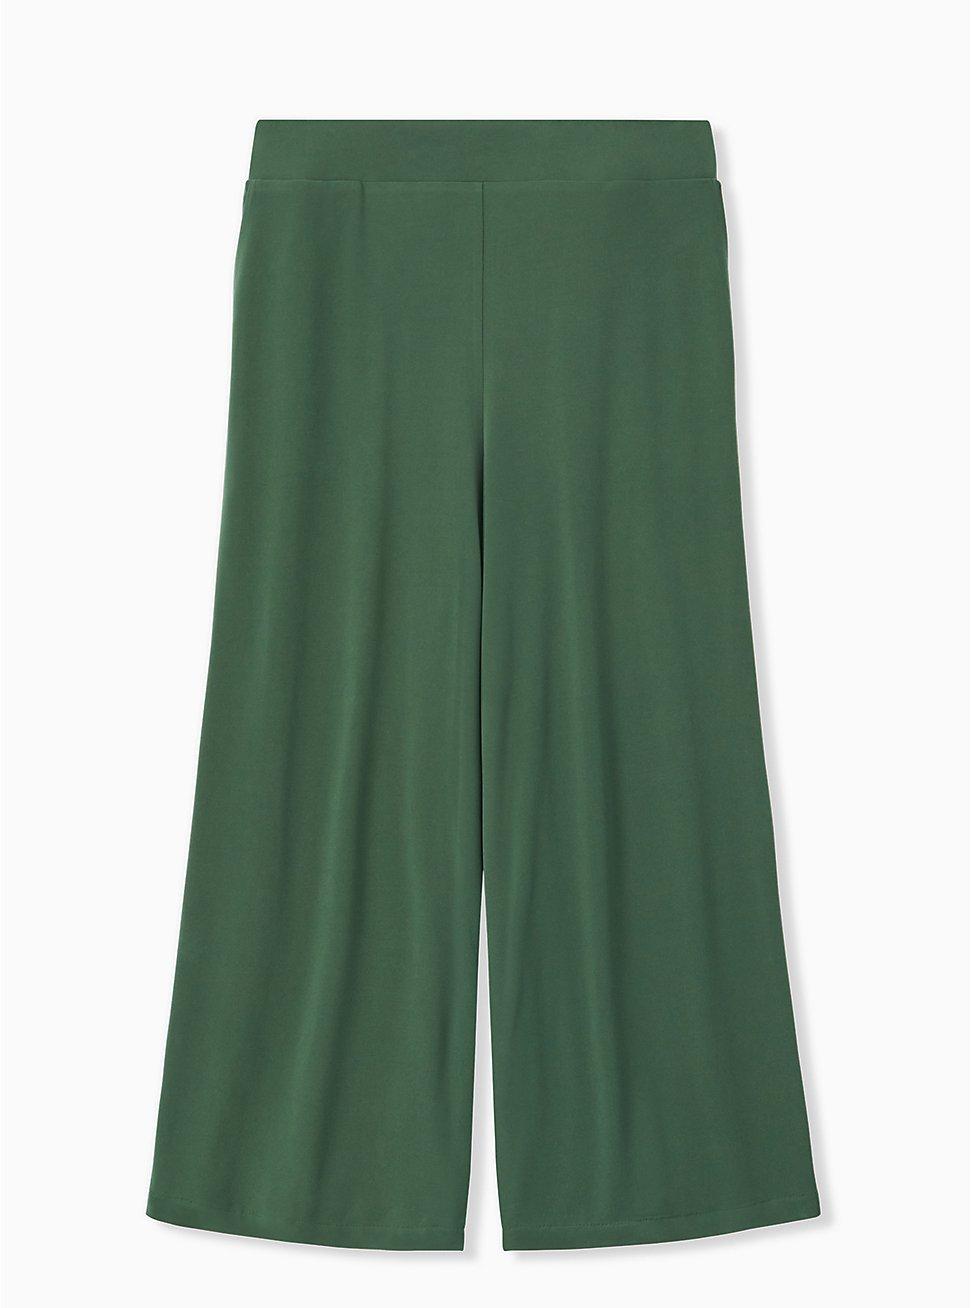 Plus Size Green Studio Knit Culotte Pant, GARDEN TOPIARY, hi-res